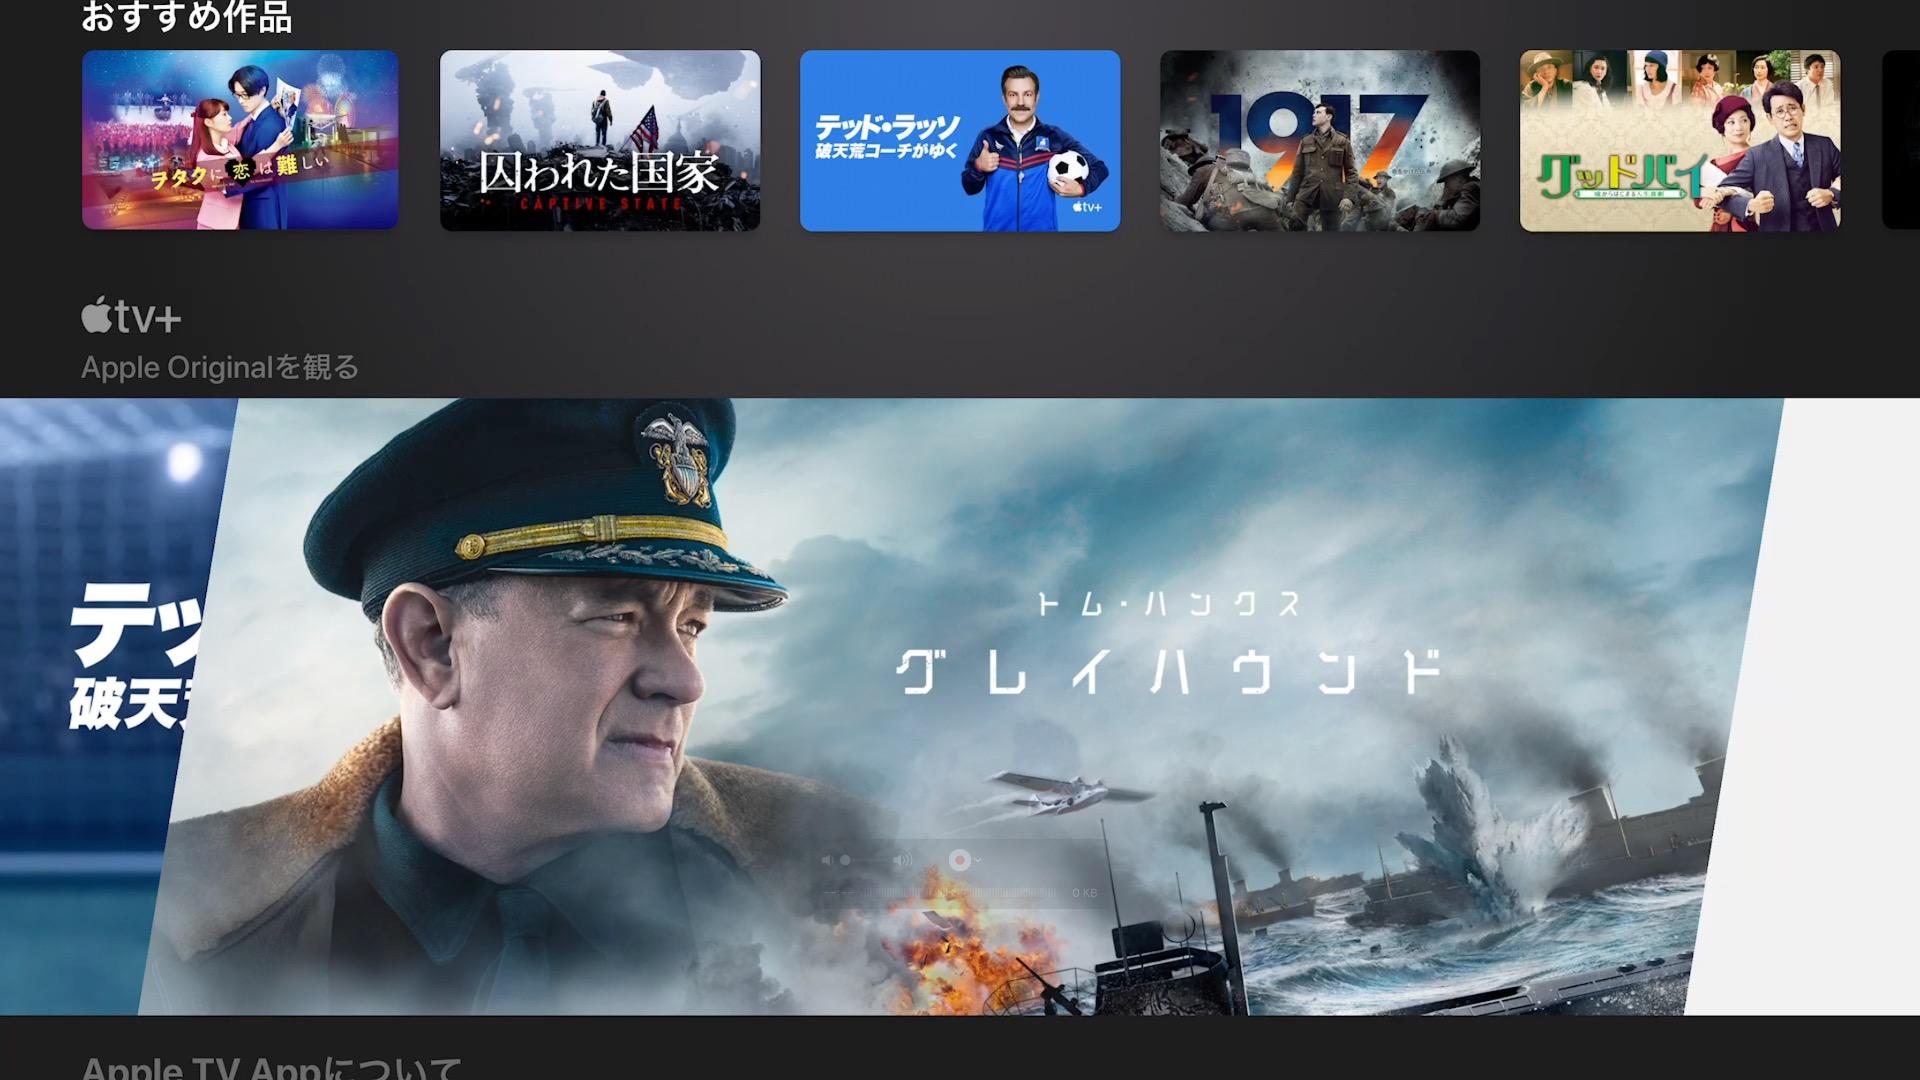 App Store - Apple TV